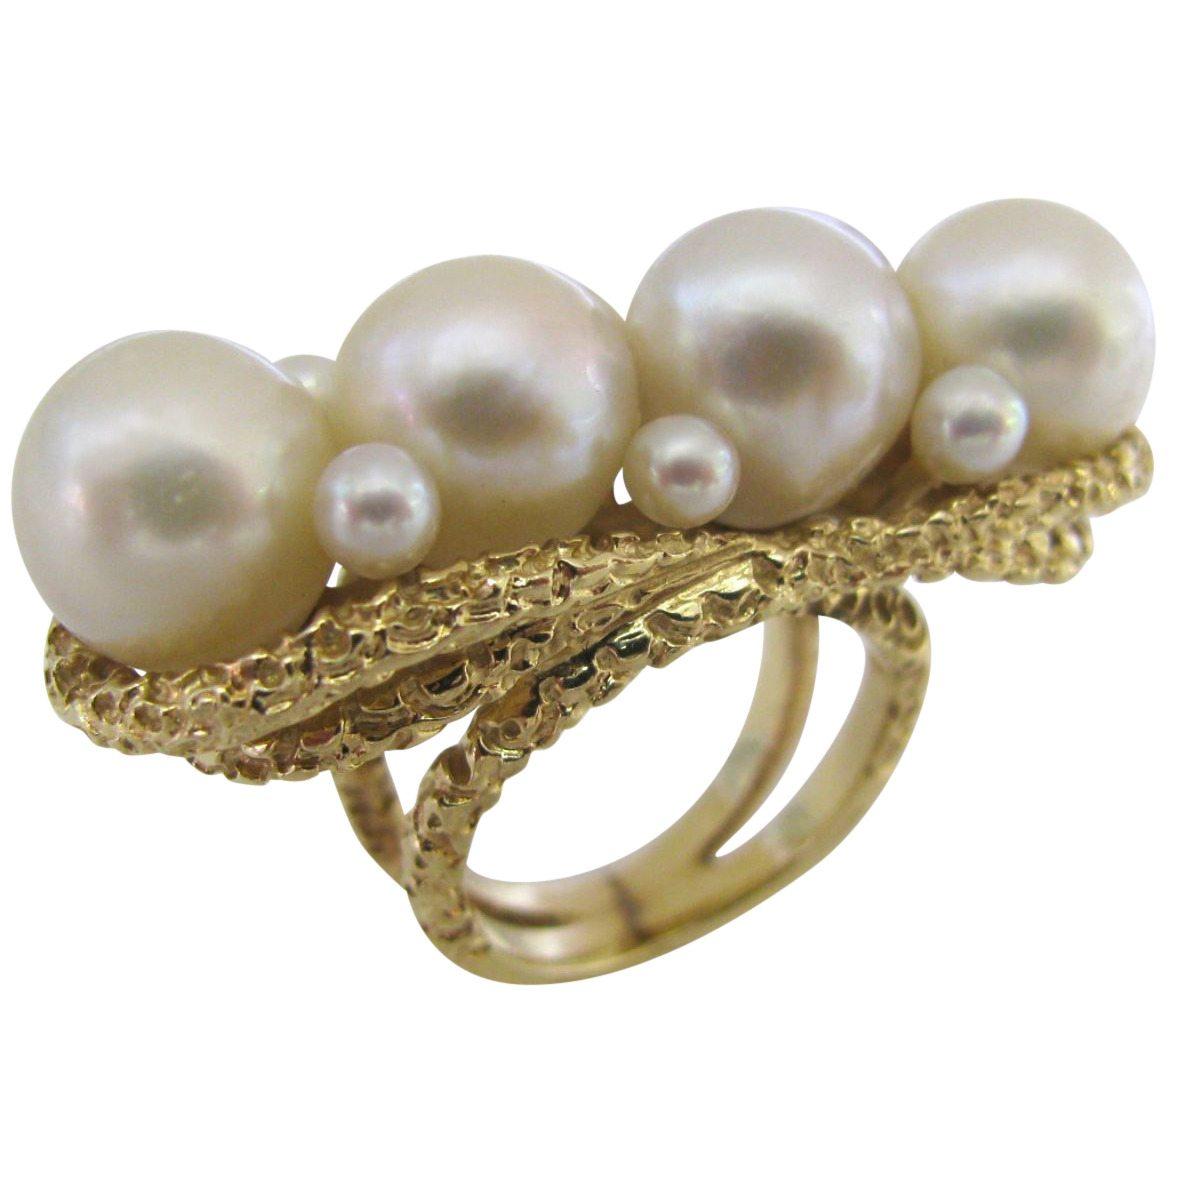 Ring, circa 1960. Foto Kimberly Klosterman, goud, parel